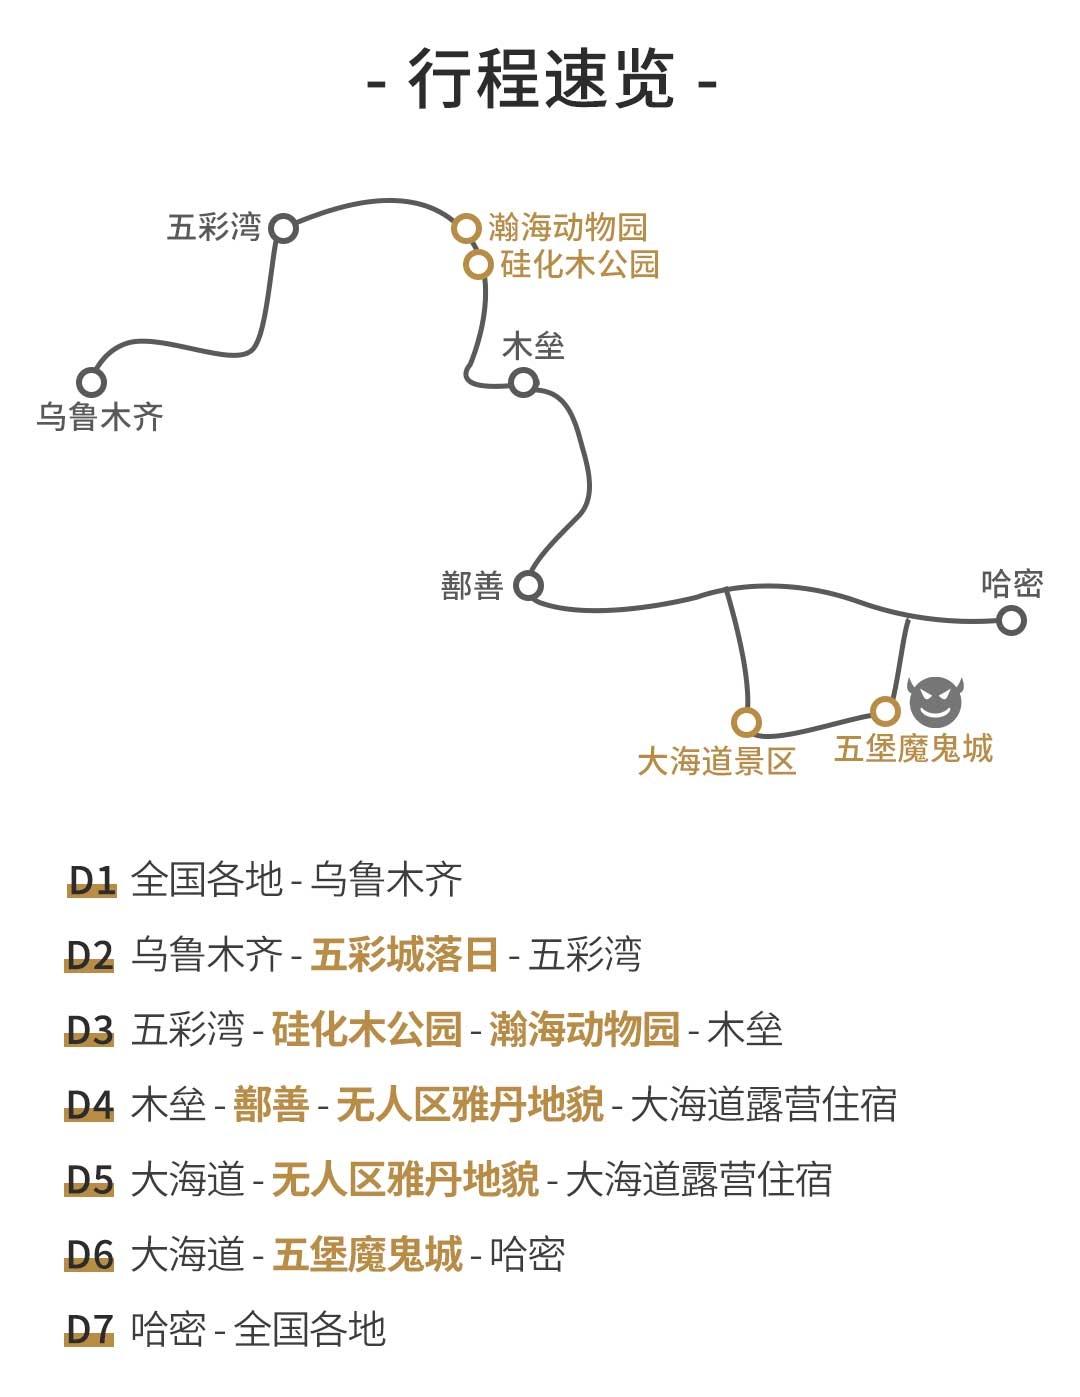 B1-HQB-022+1_02